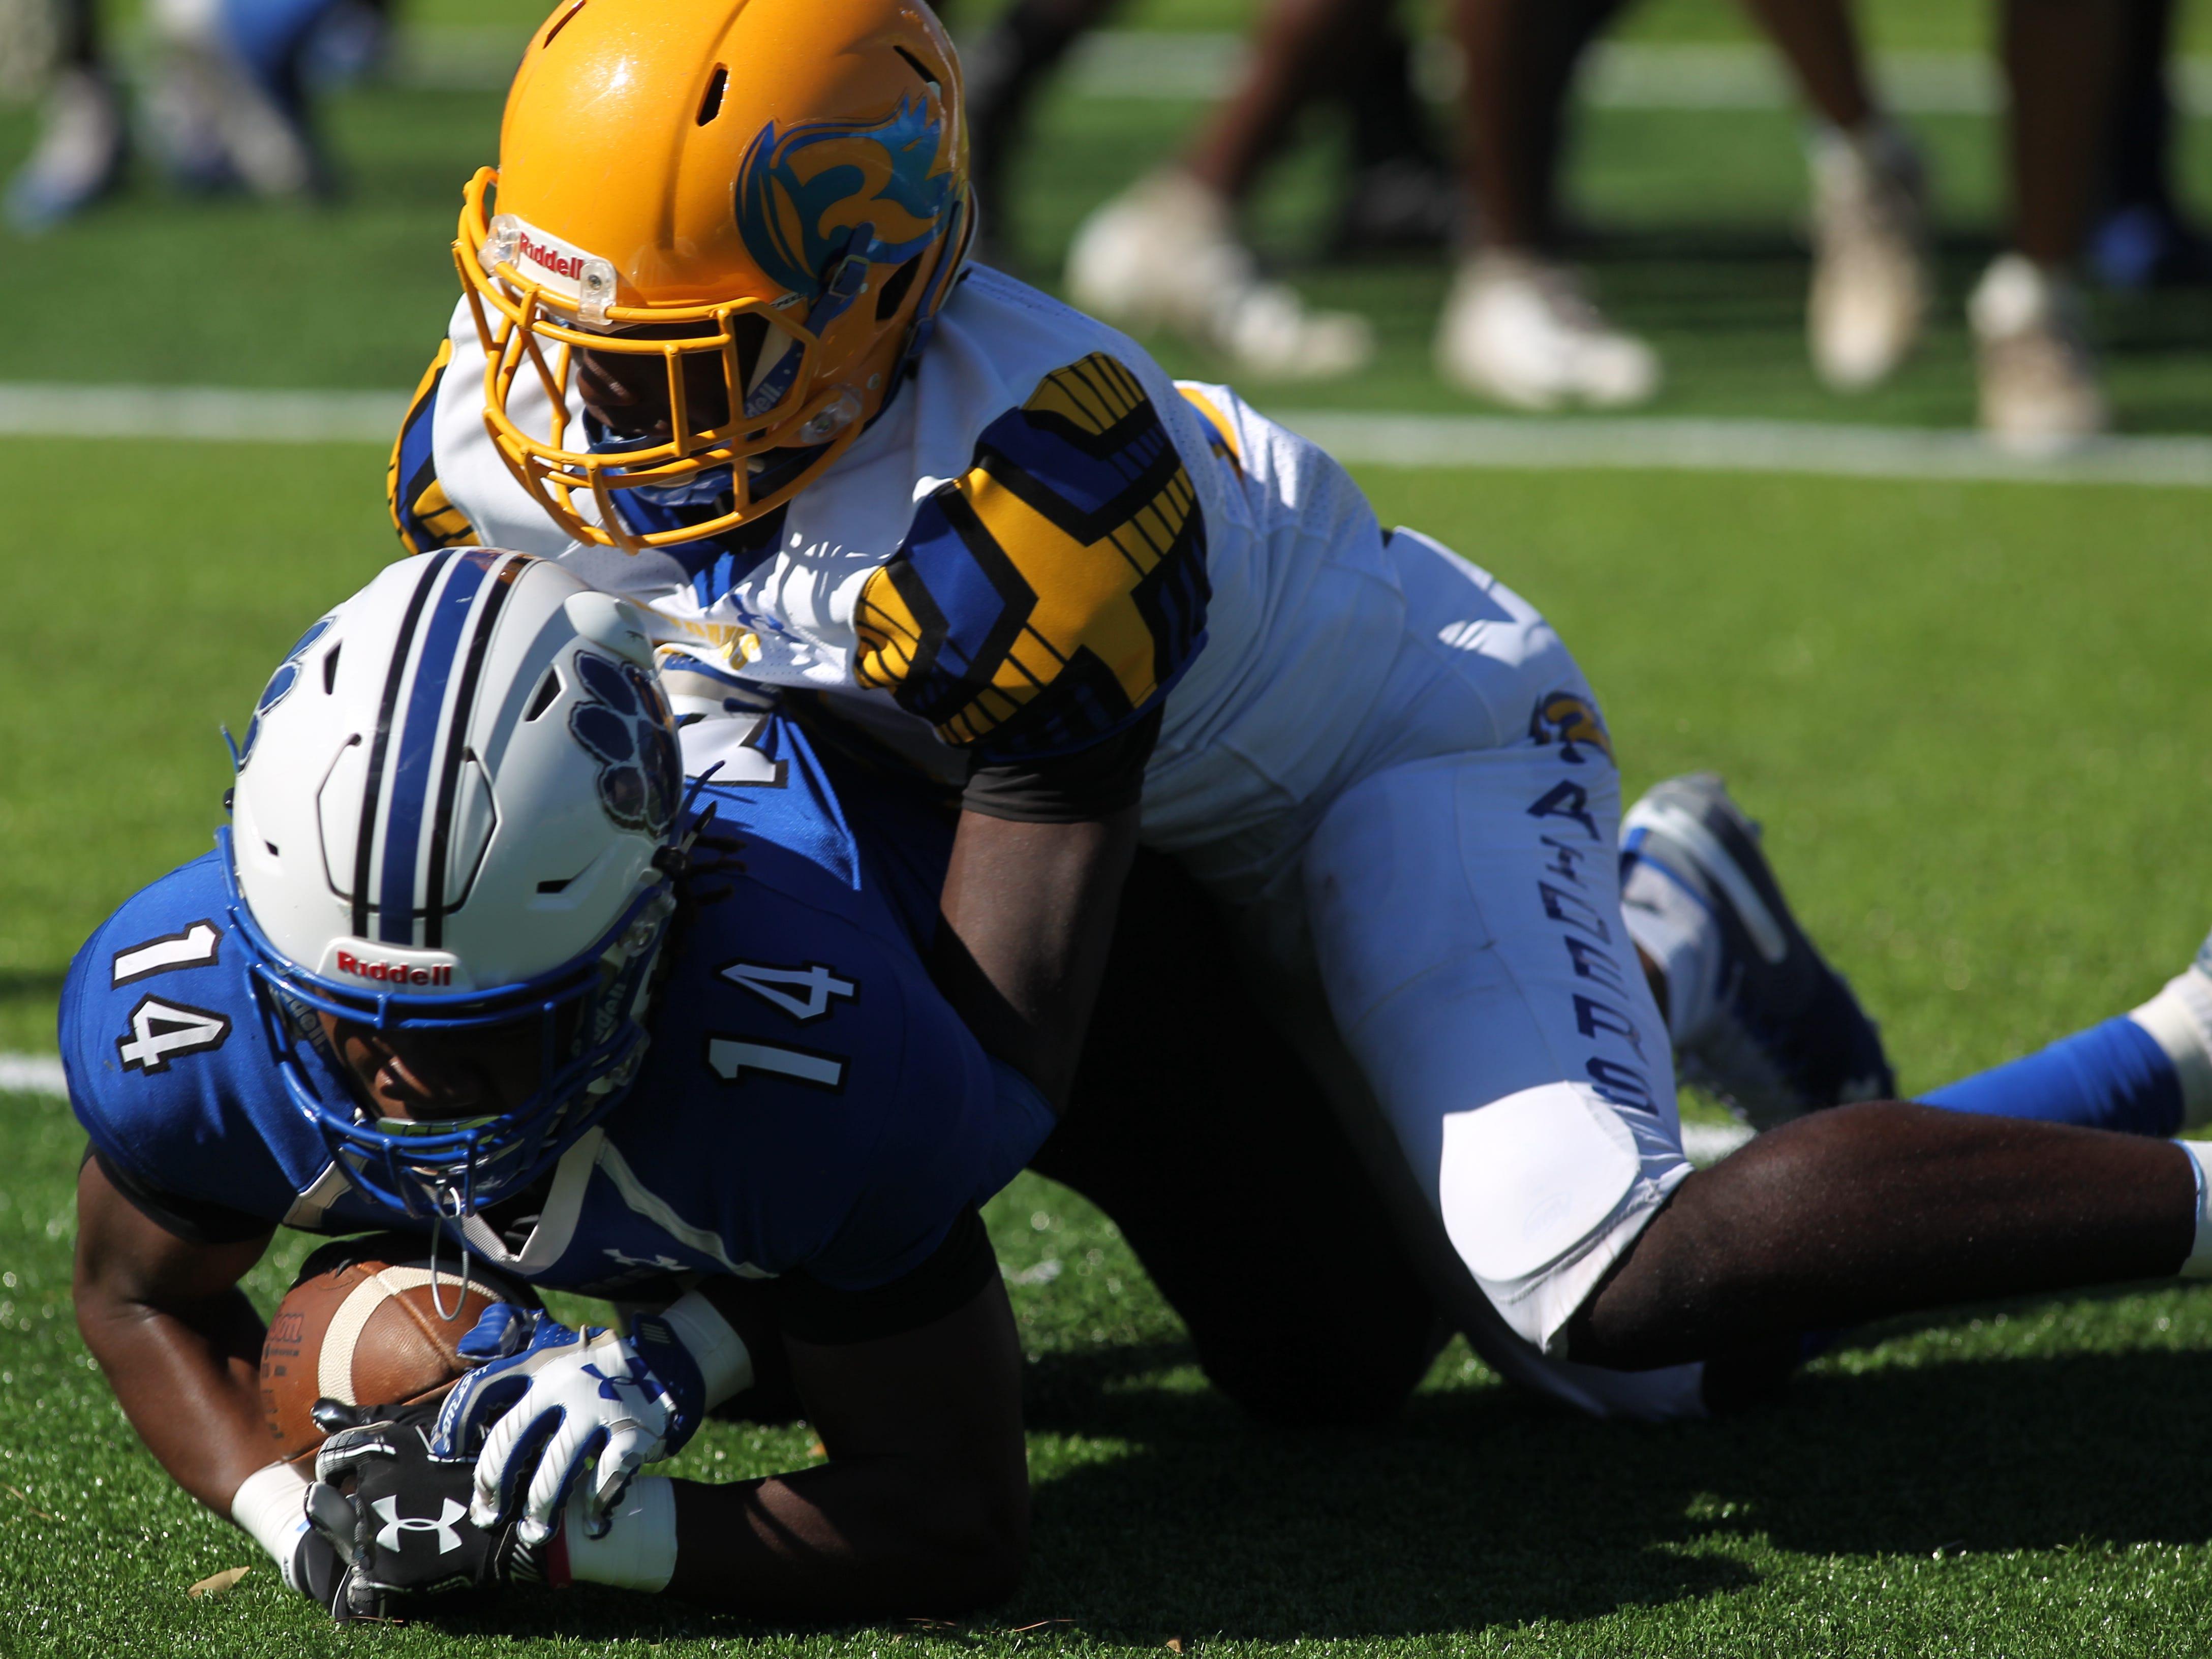 Godby receiver Ja'heim Knight catches a 5-yard touchdown pass against Rickards.